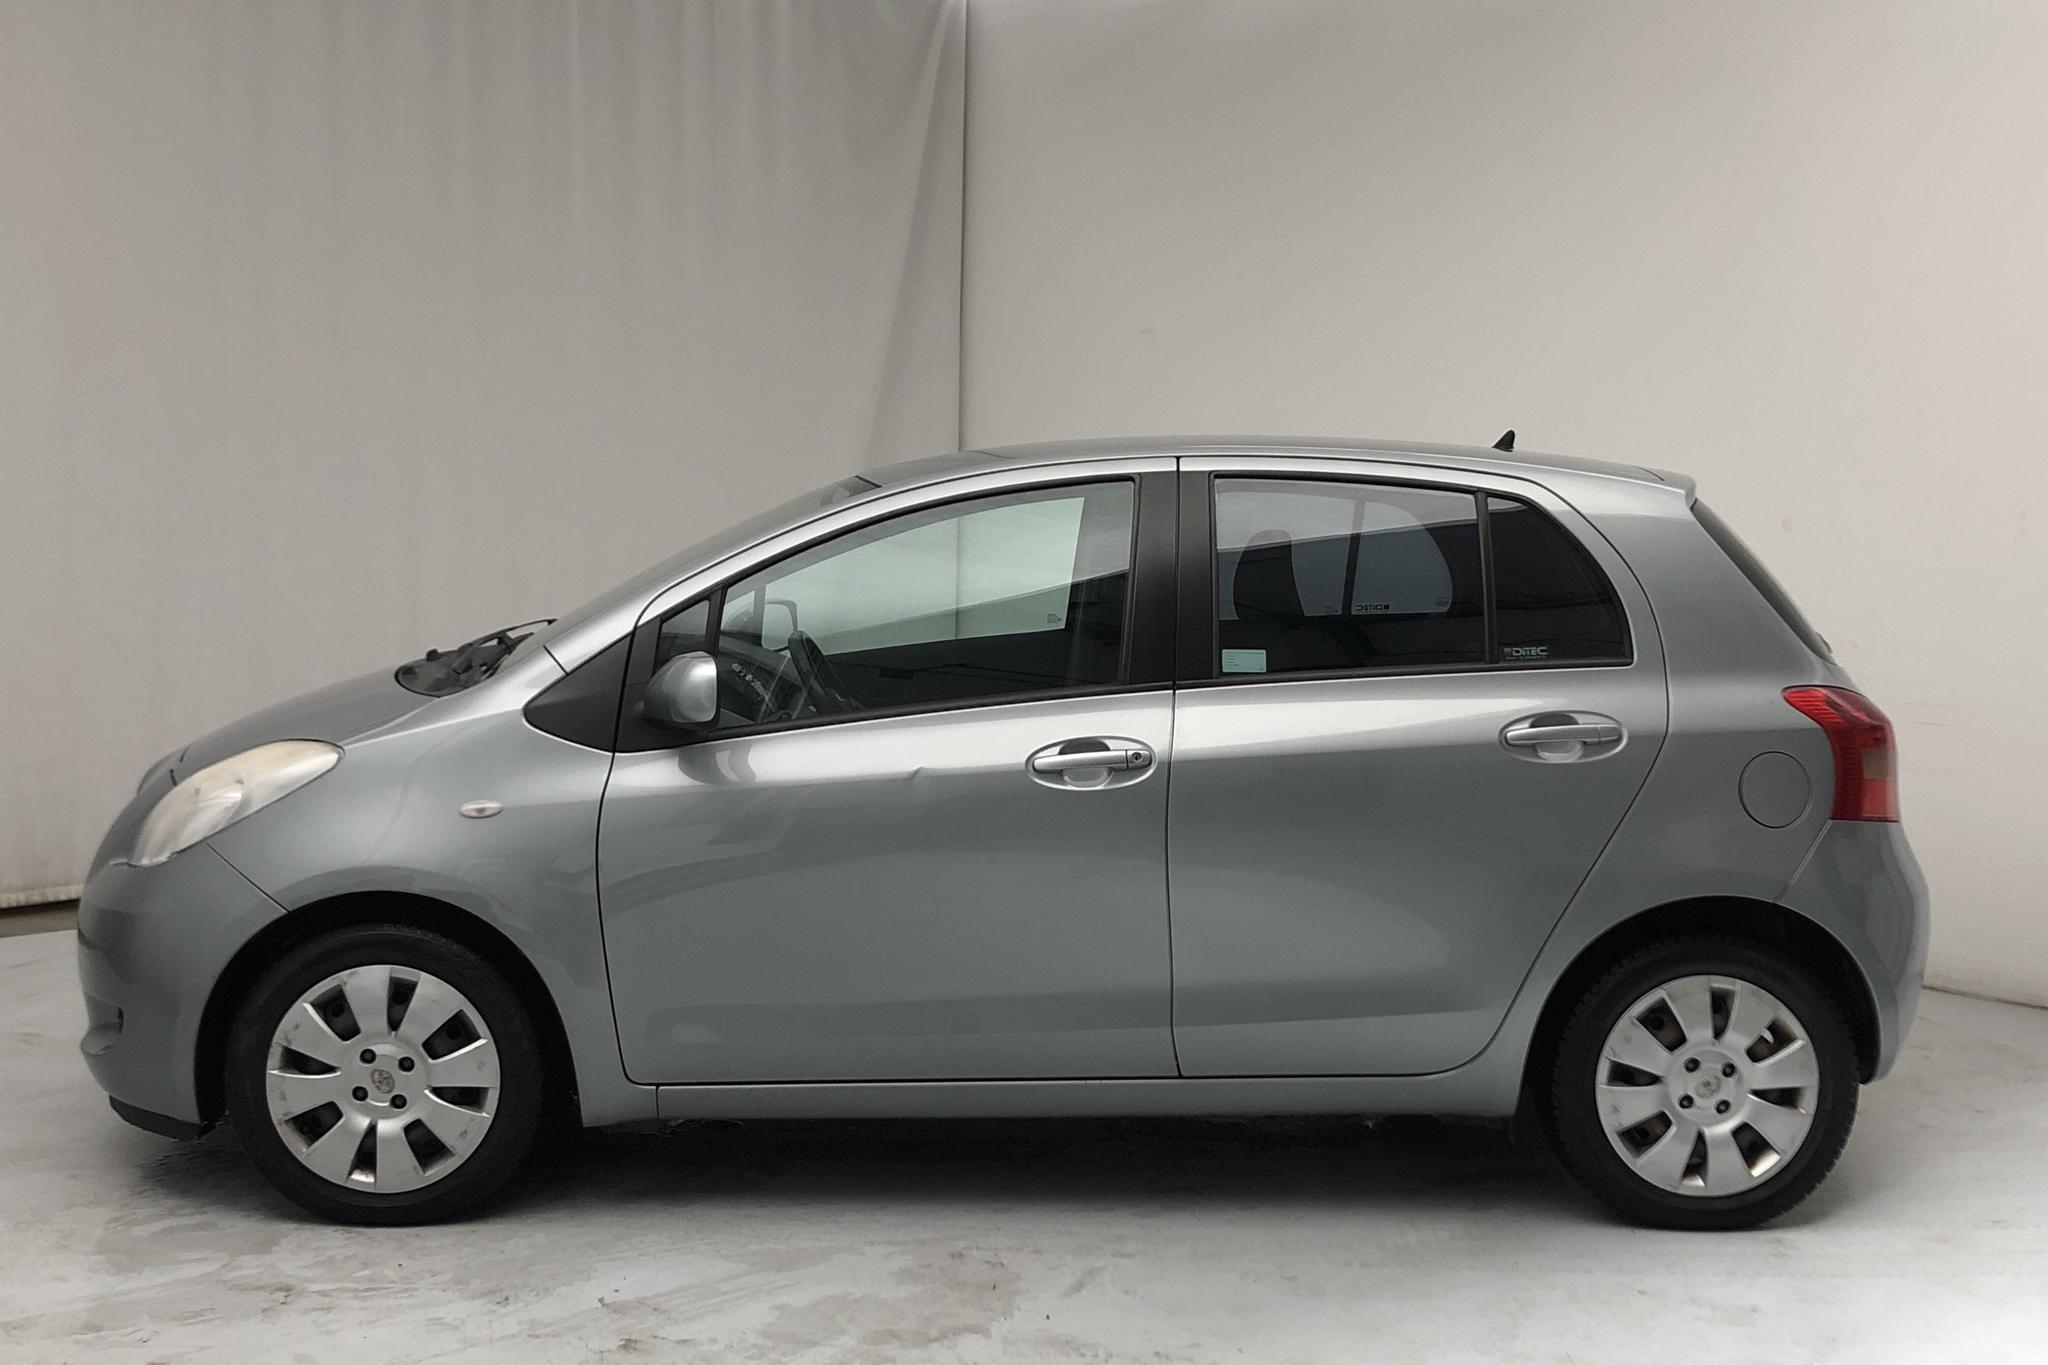 Toyota Yaris 1.3 5dr (87hk) - 125 060 km - Manual - gray - 2006